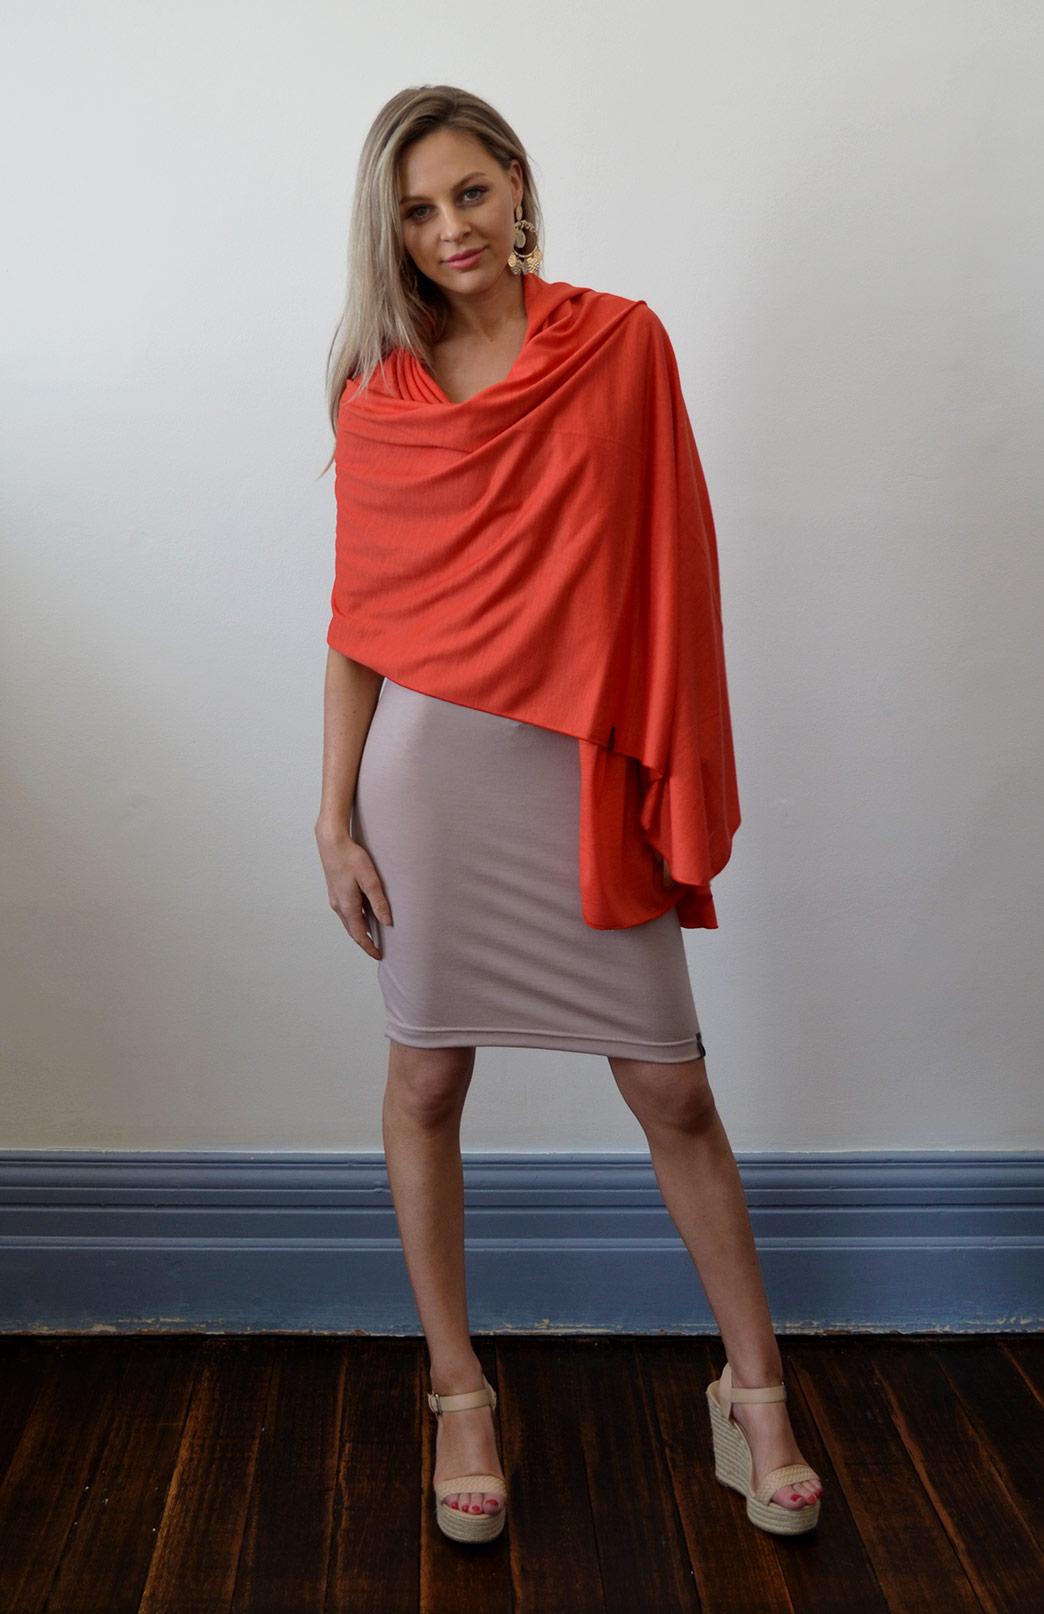 Scarves - Lightweight - Women's Superfine Merino Wool & Modal Blend Classic Wide Scarf - Smitten Merino Tasmania Australia